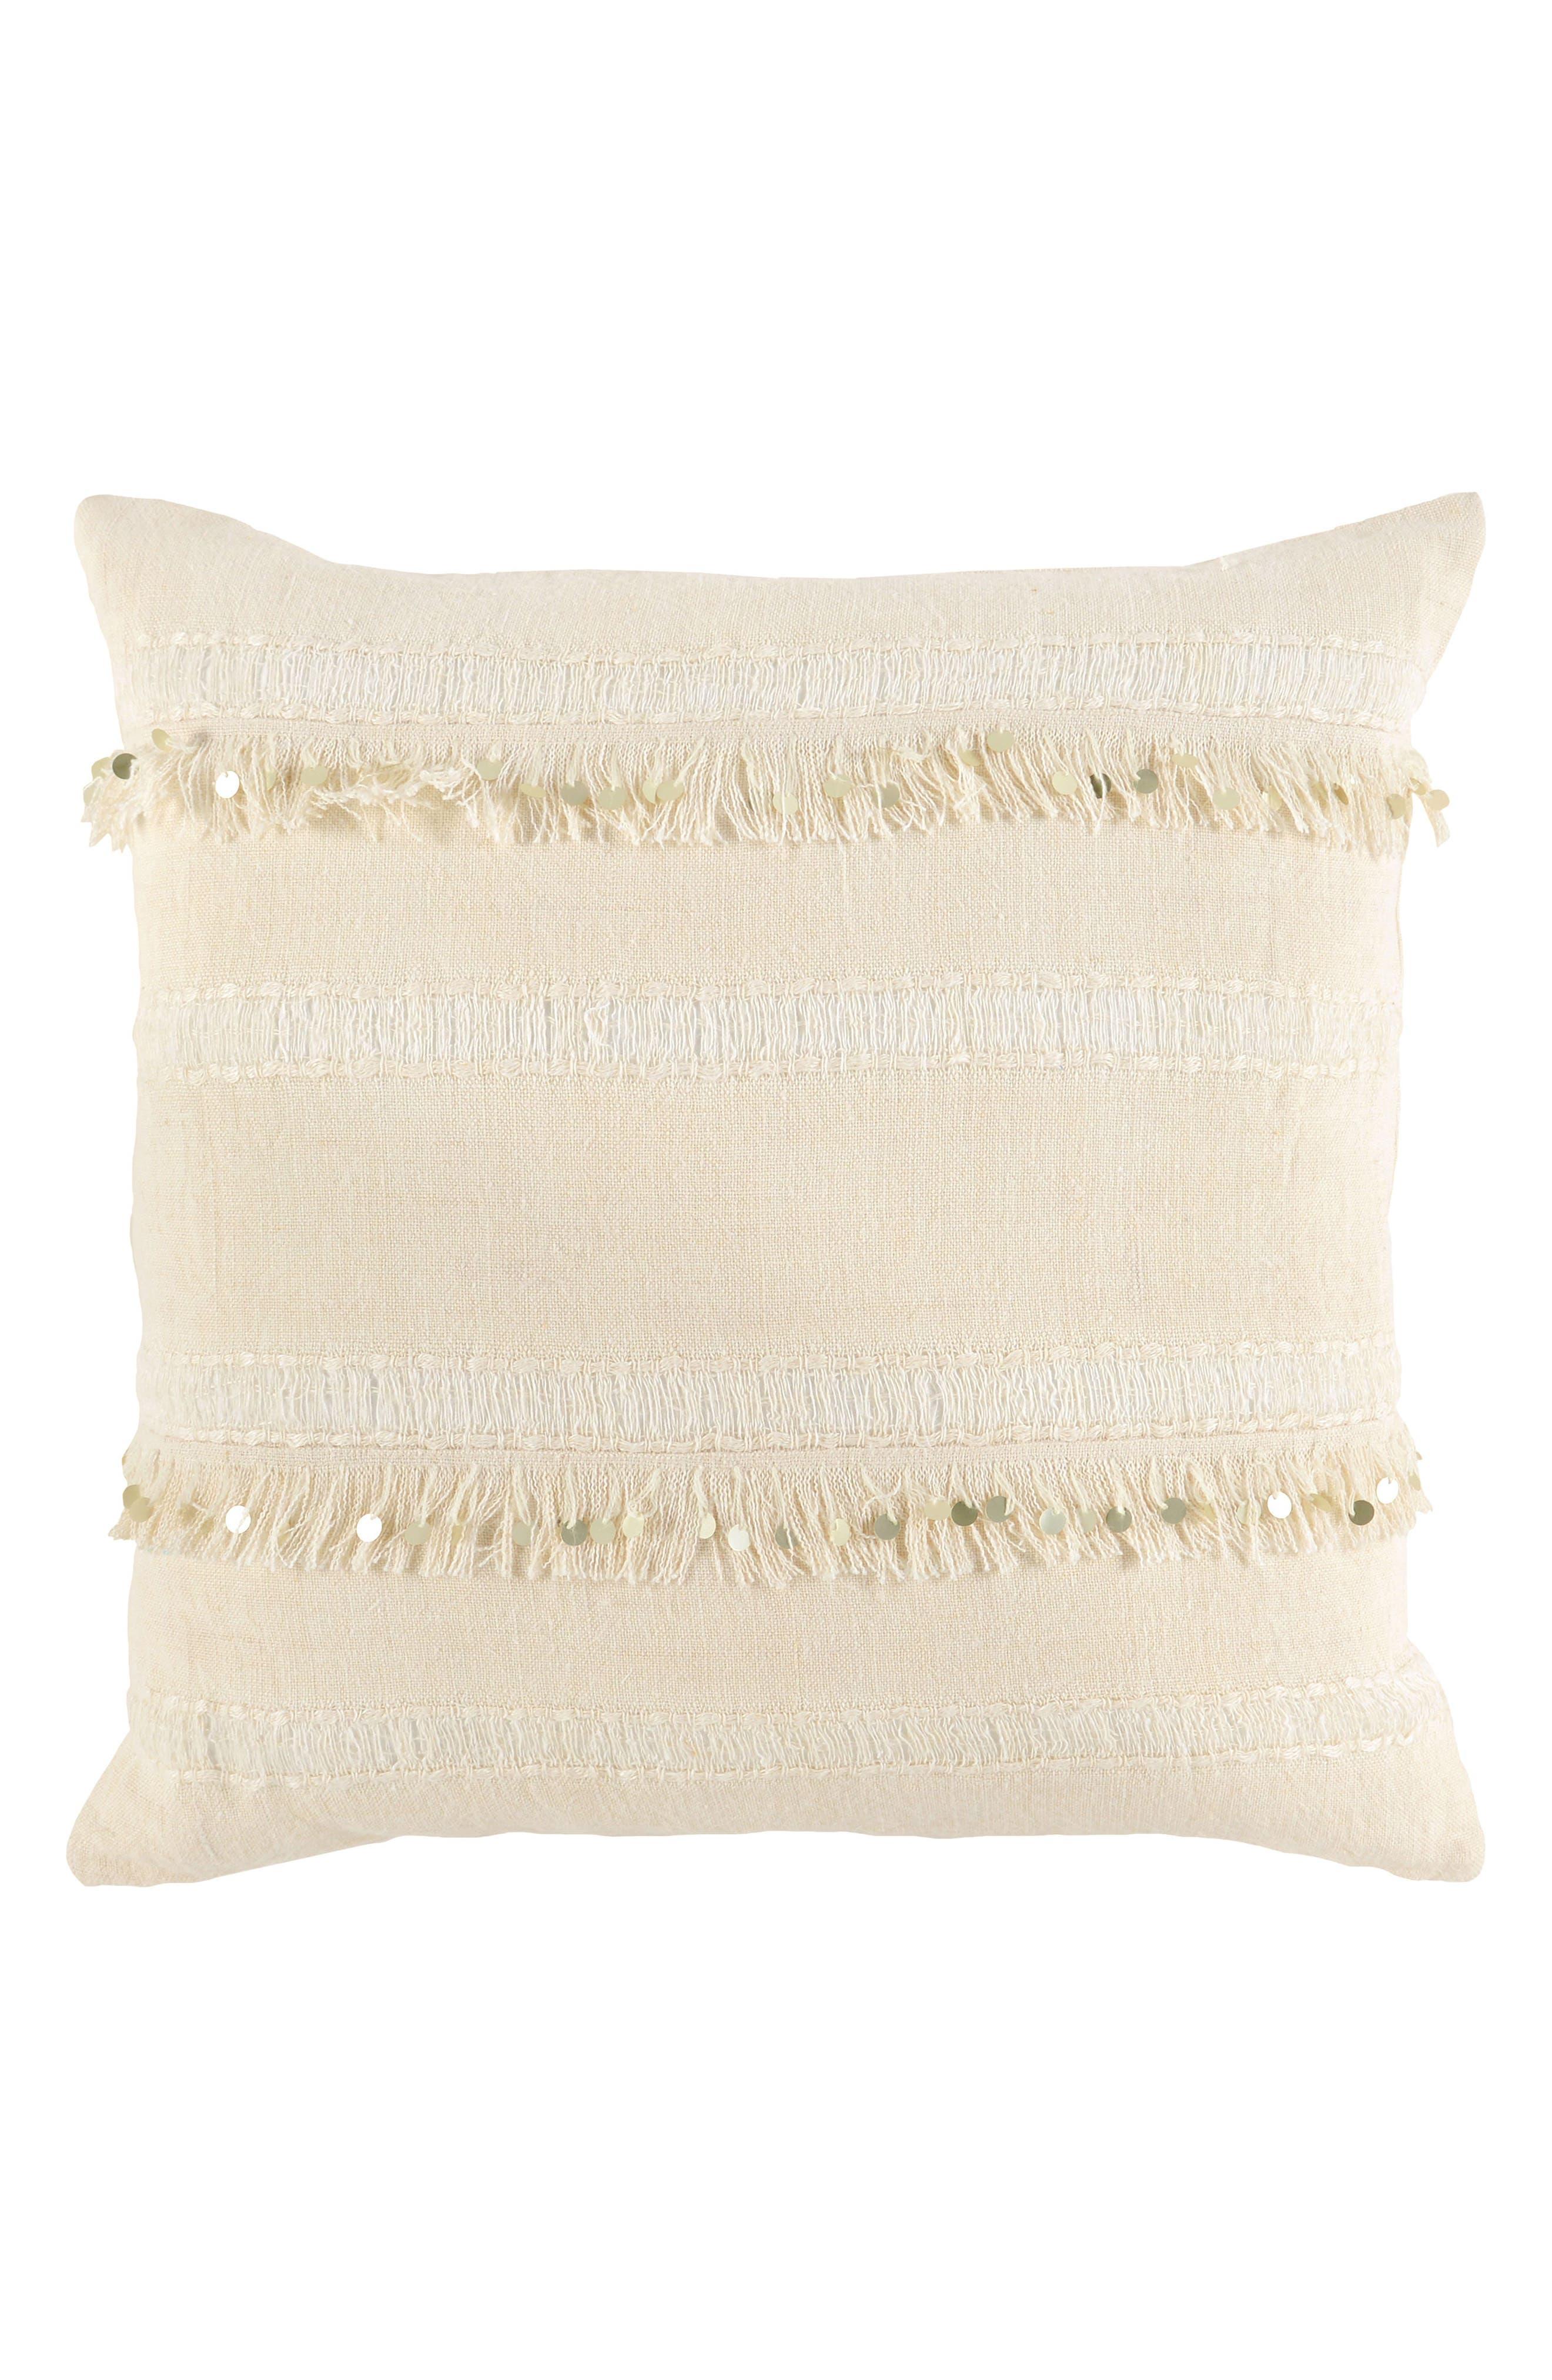 Dirade Accent Pillow,                         Main,                         color, 900